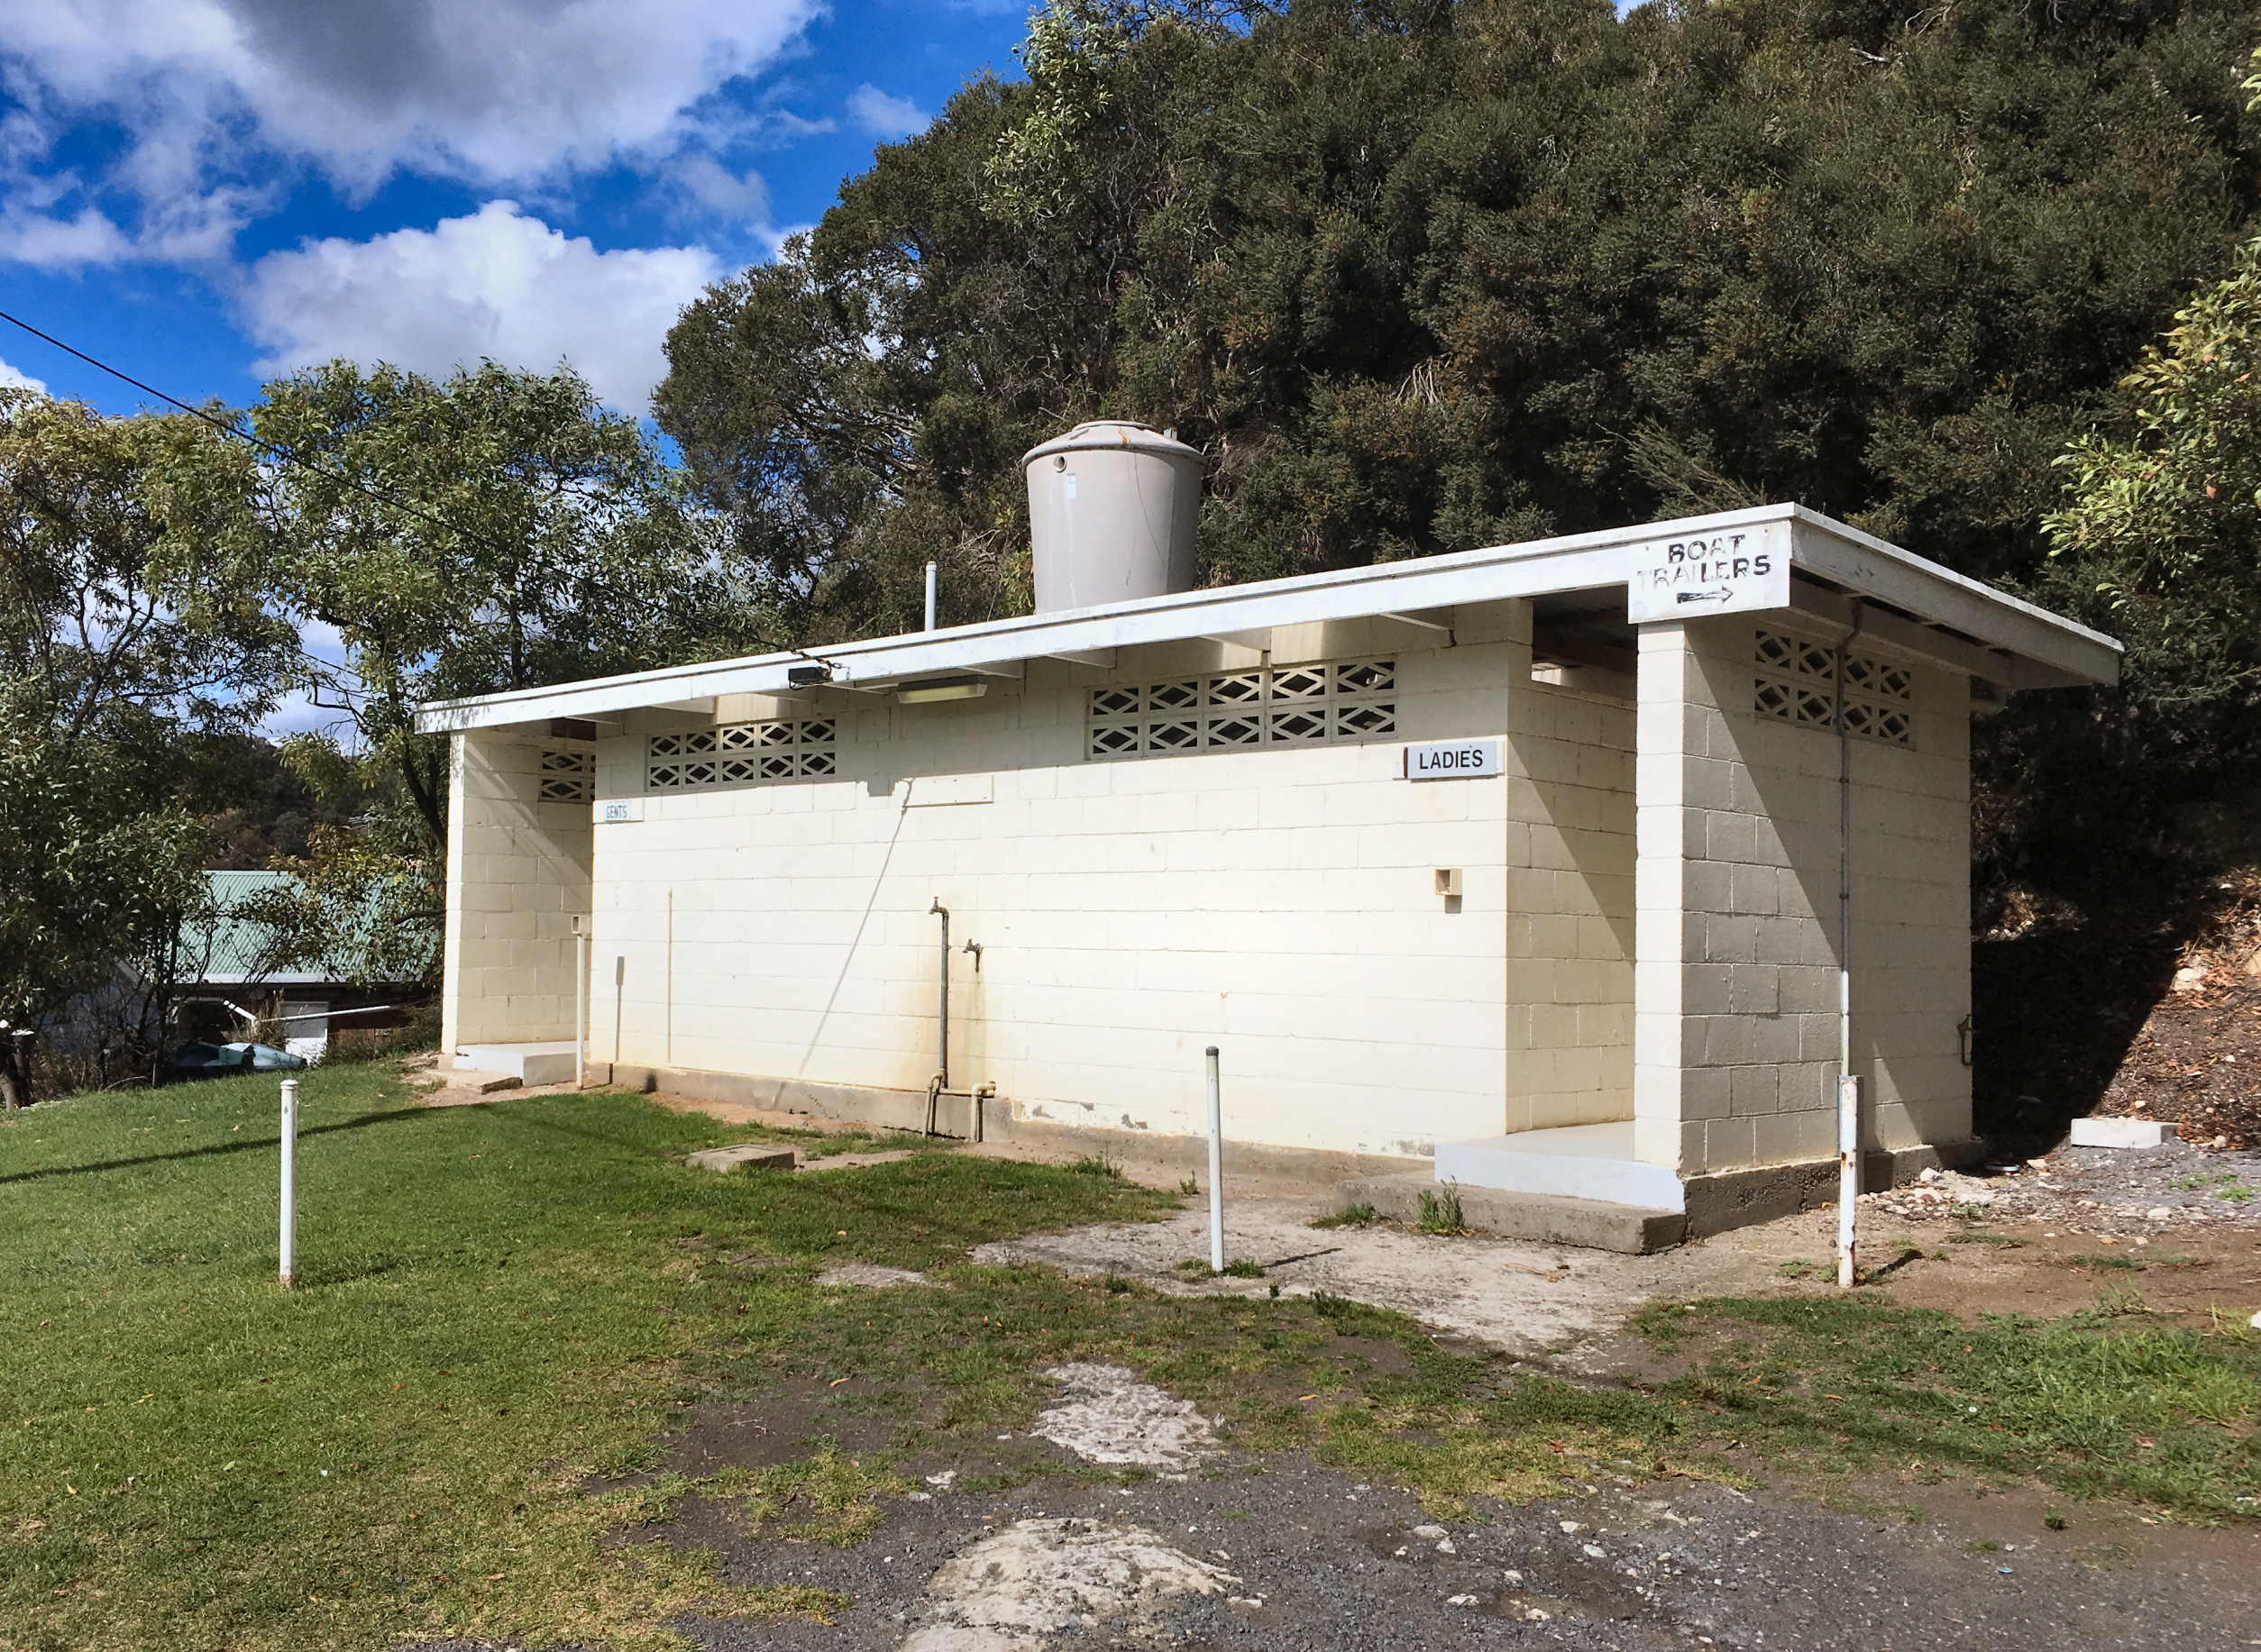 Glenelg public toilets